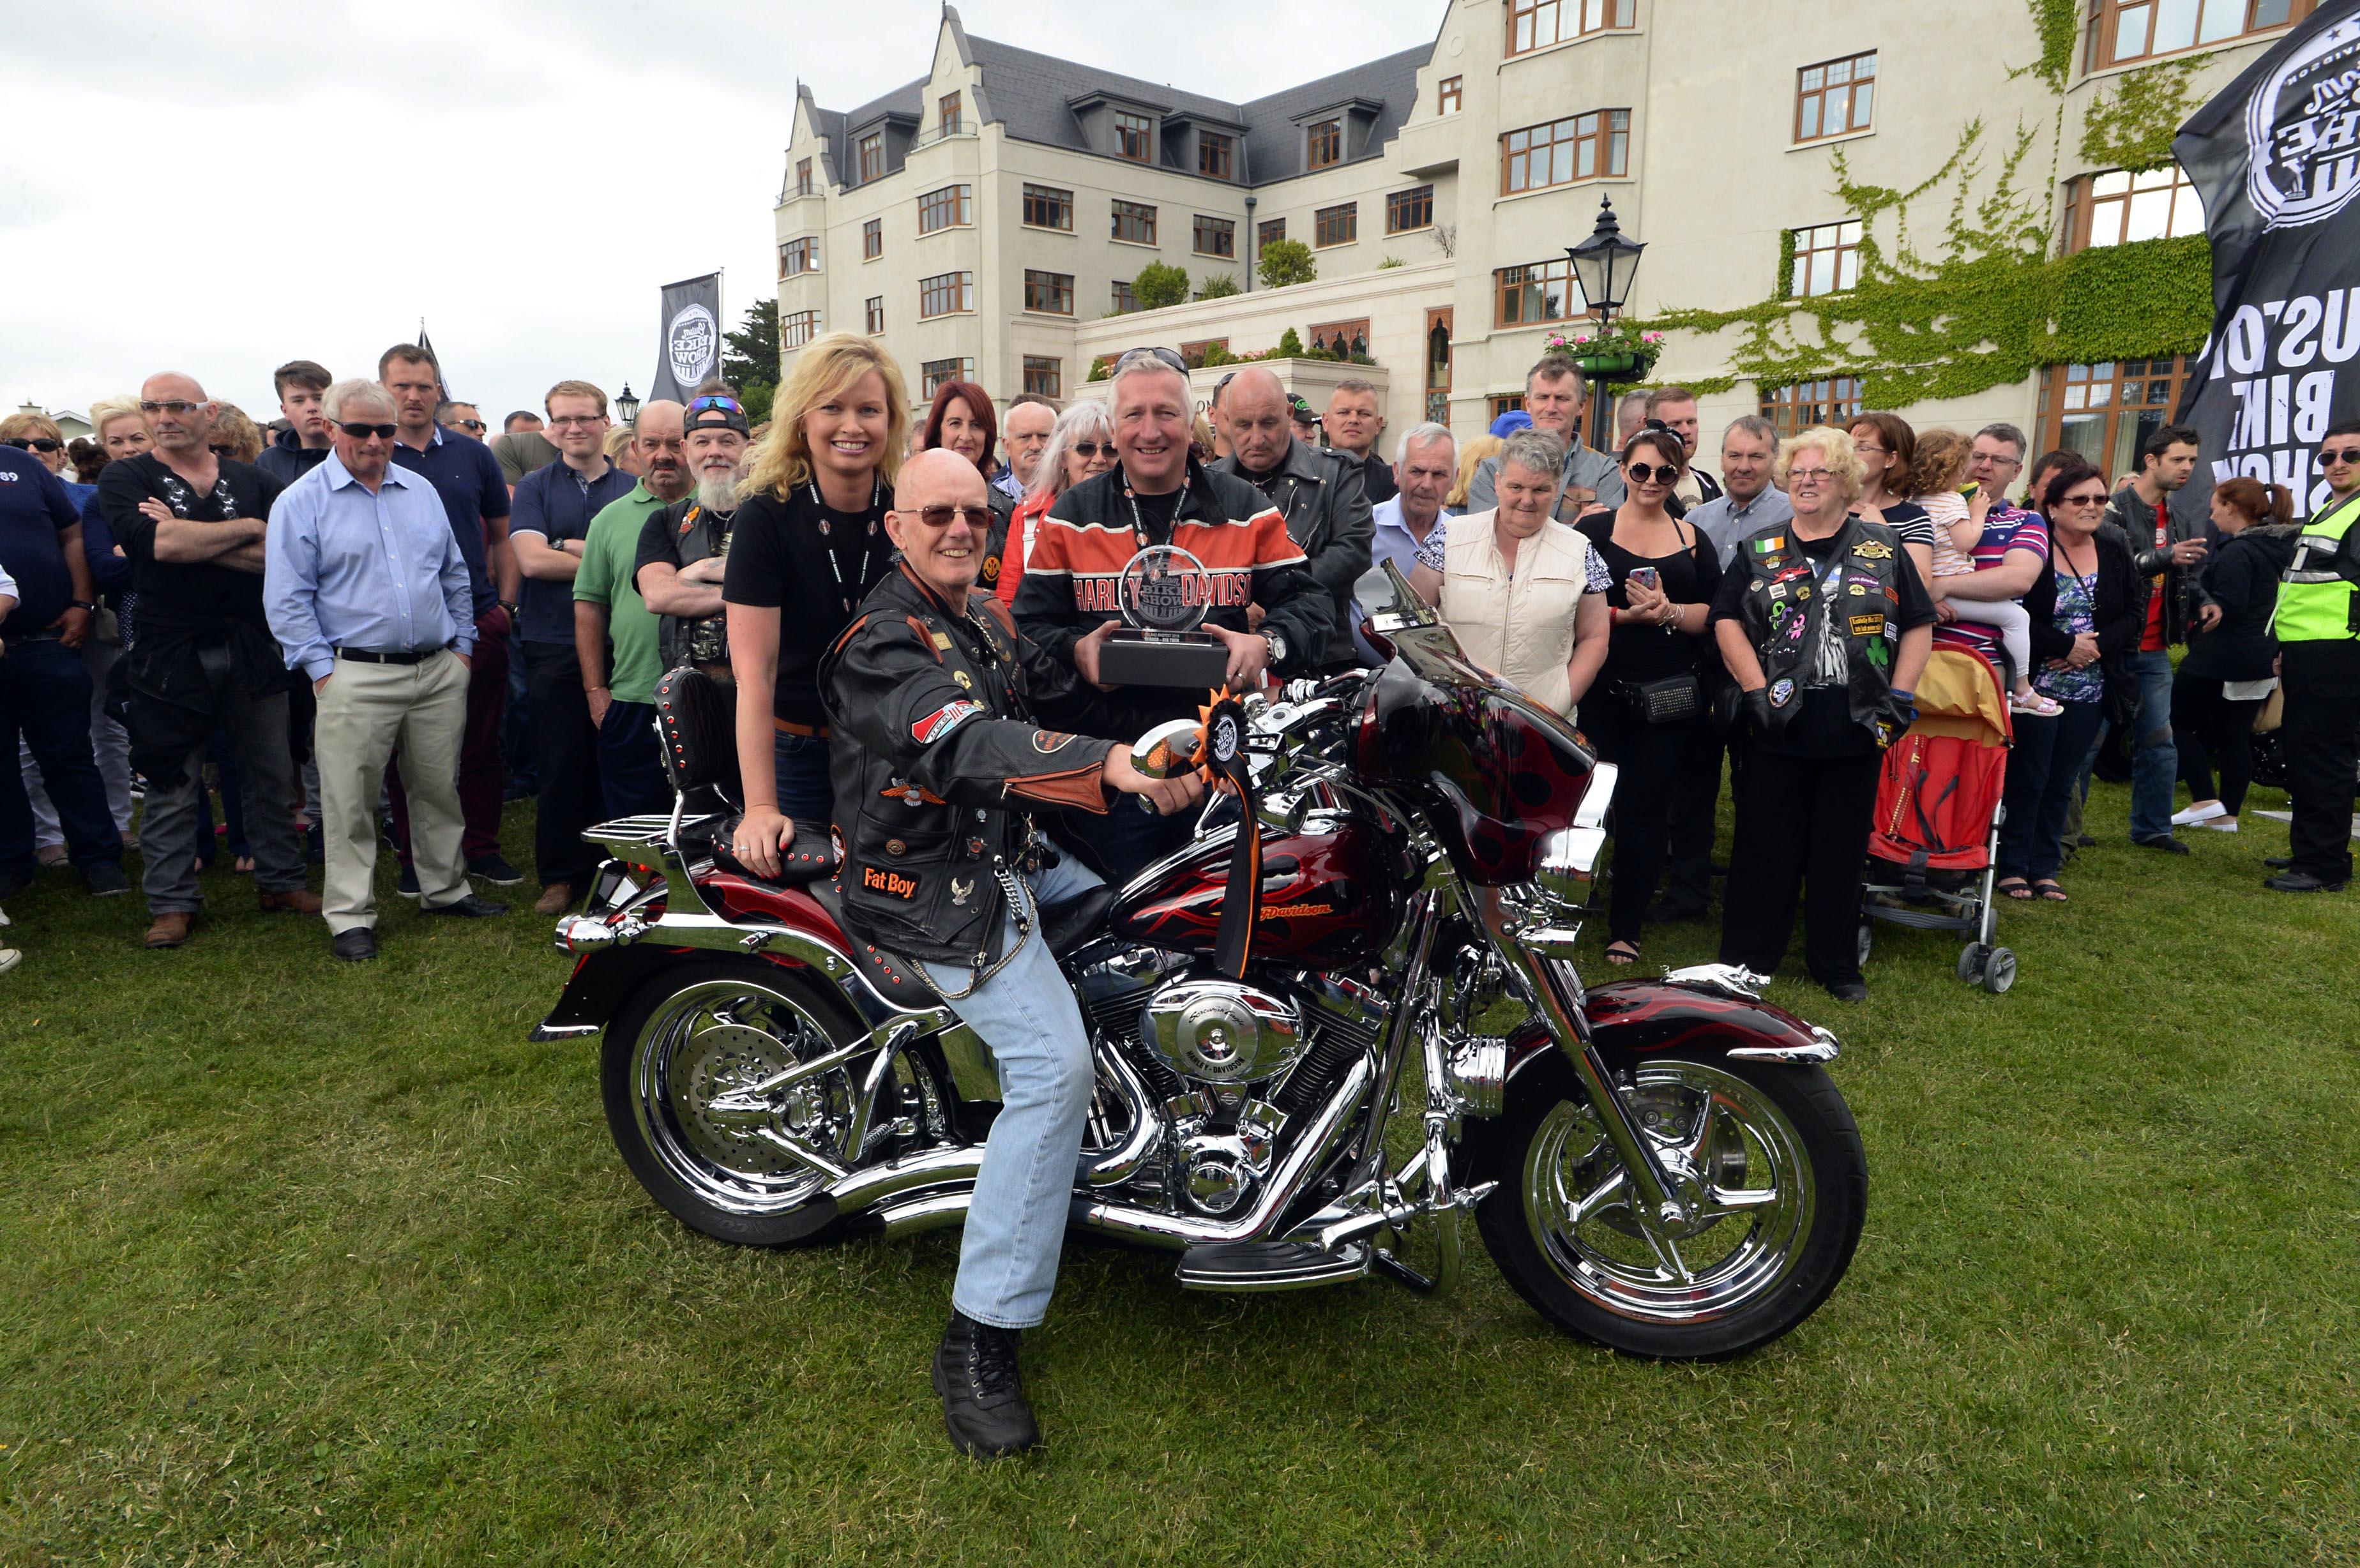 Harley Davidson Dealers Open On Sunday